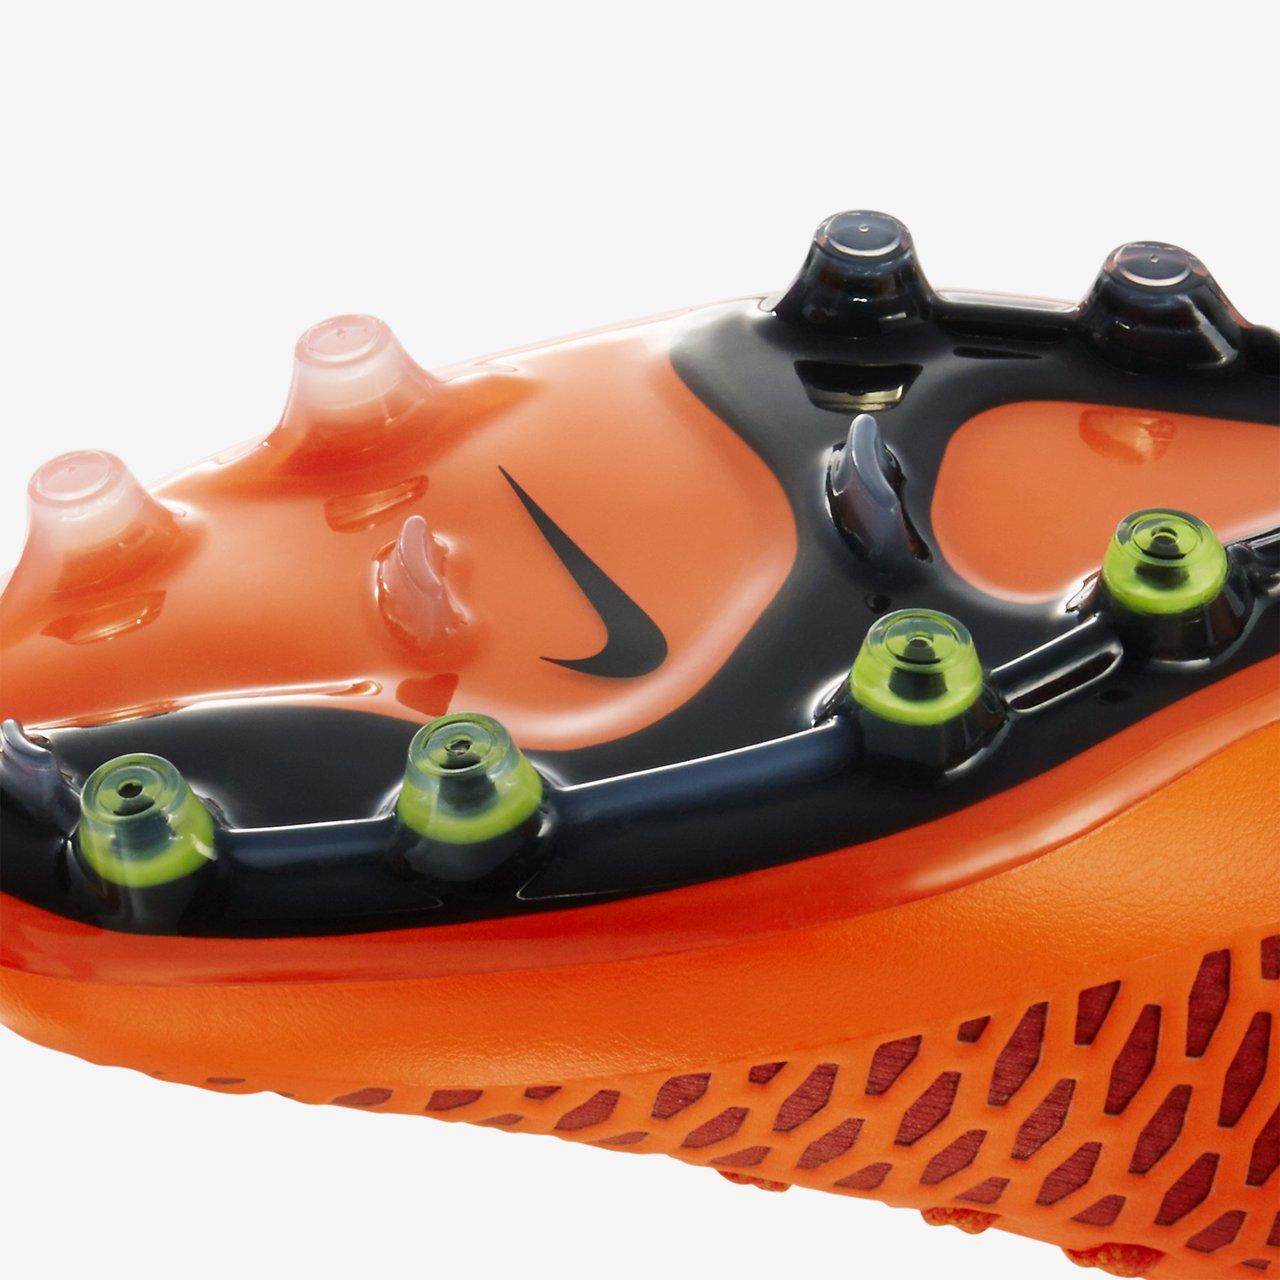 fa279920a56f Nike Magista Opus FG Boots - Intense Heat Pack - Total Orange ...